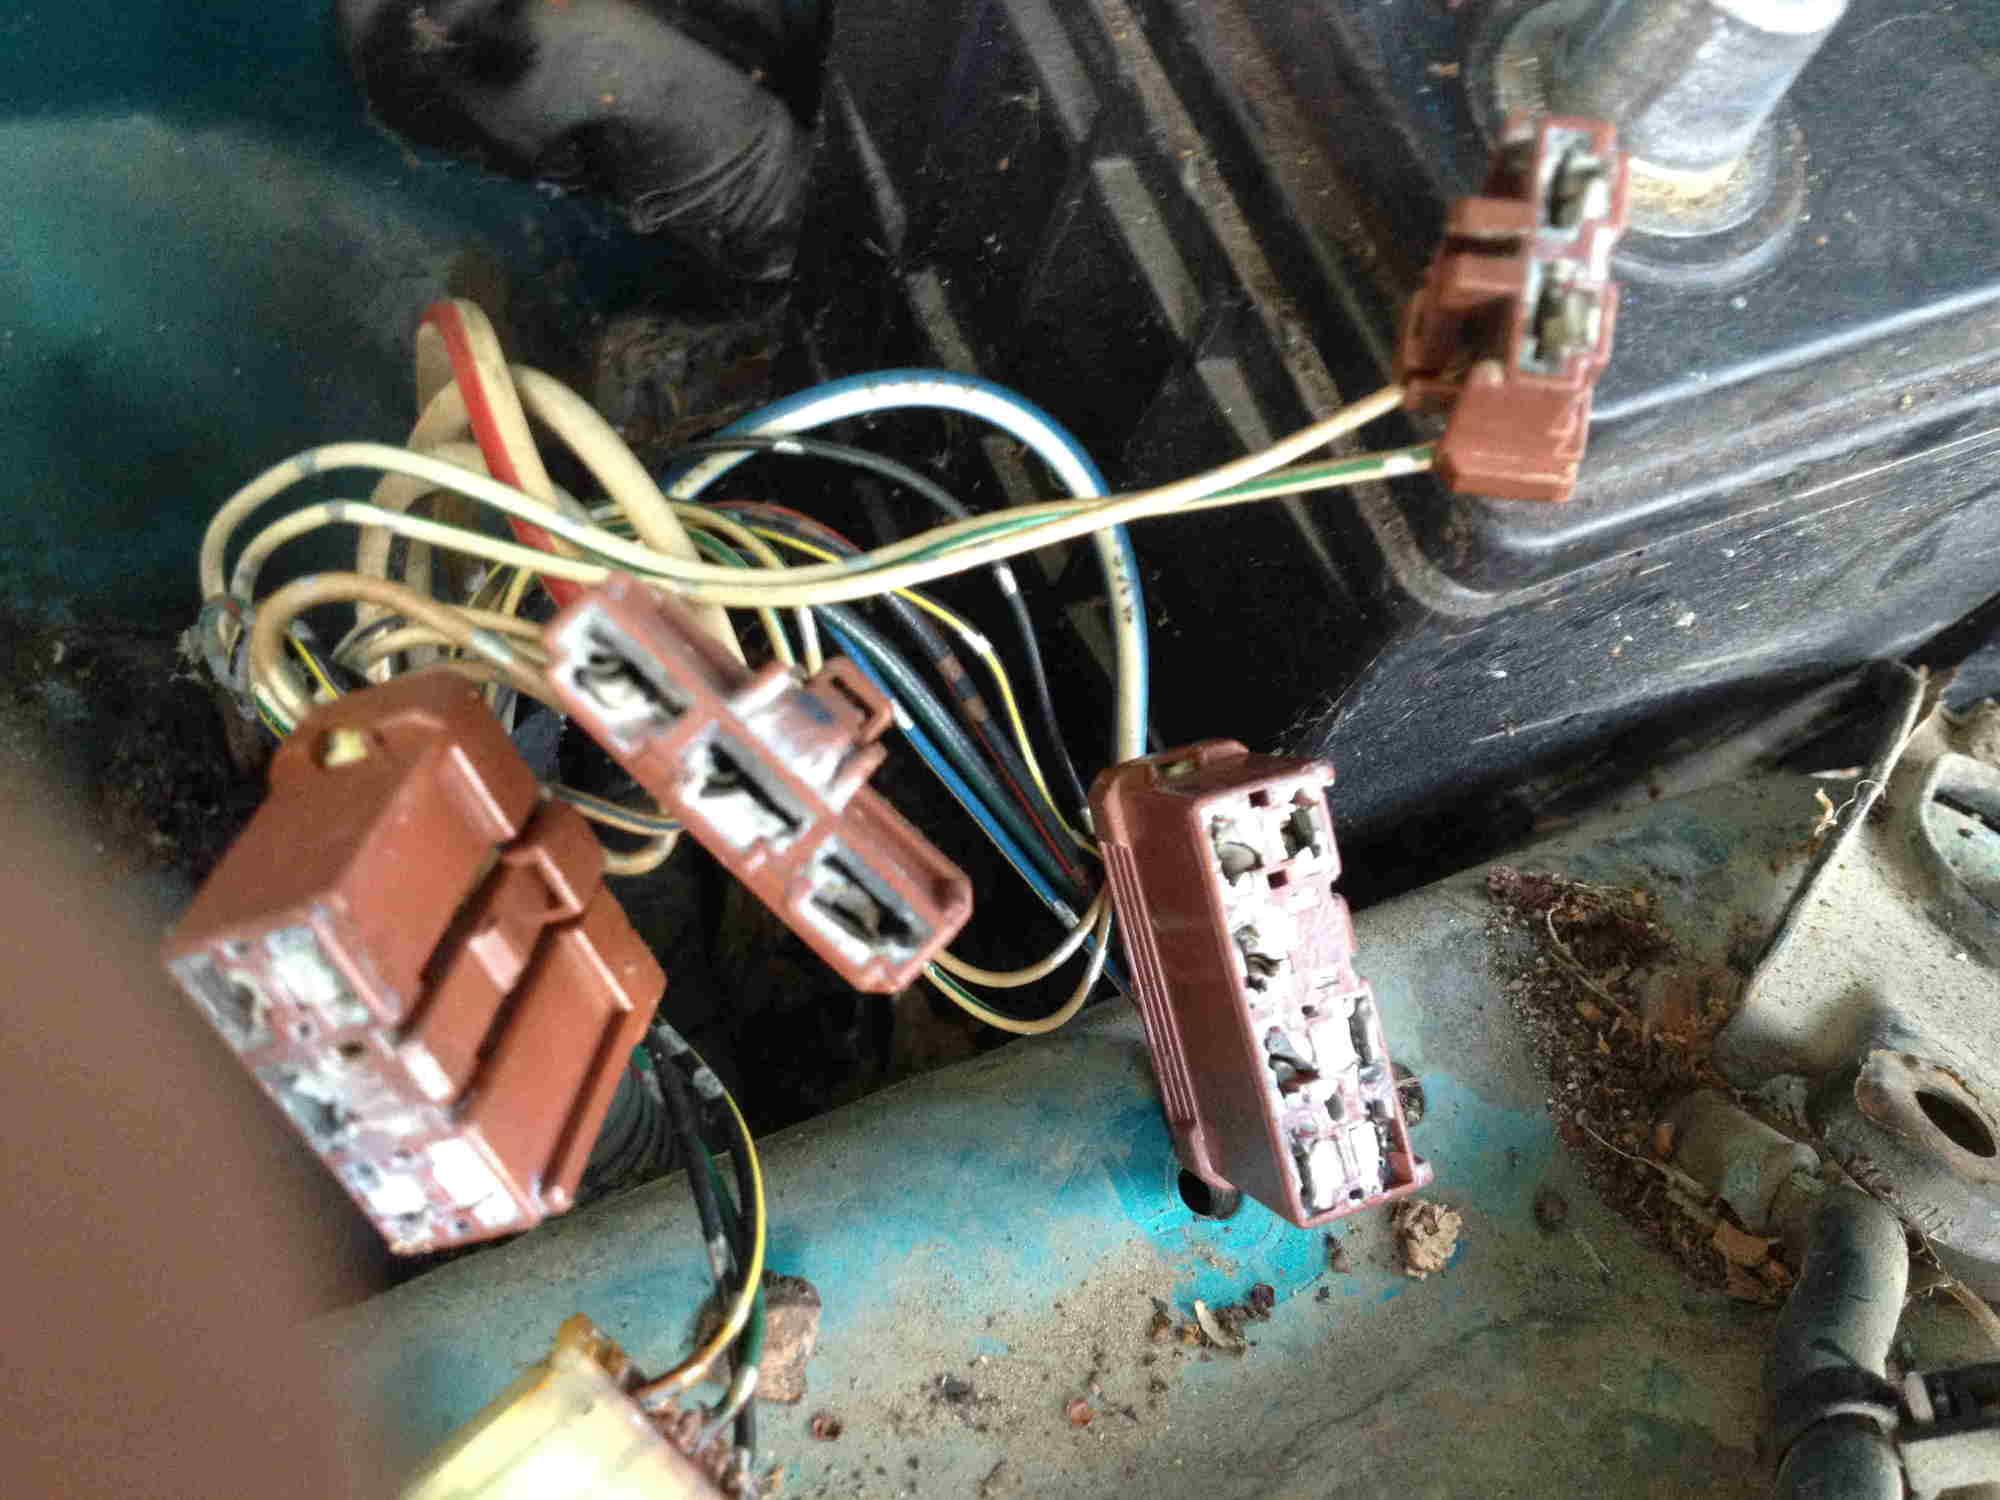 80-img_0922b_6bd40193392aa7c0da9152c19c1c7ccec4674ef4  Accord Fuel Pump Relay Wiring on diagram leroy diesel, diagram chrysler external, ford edis 4 system,